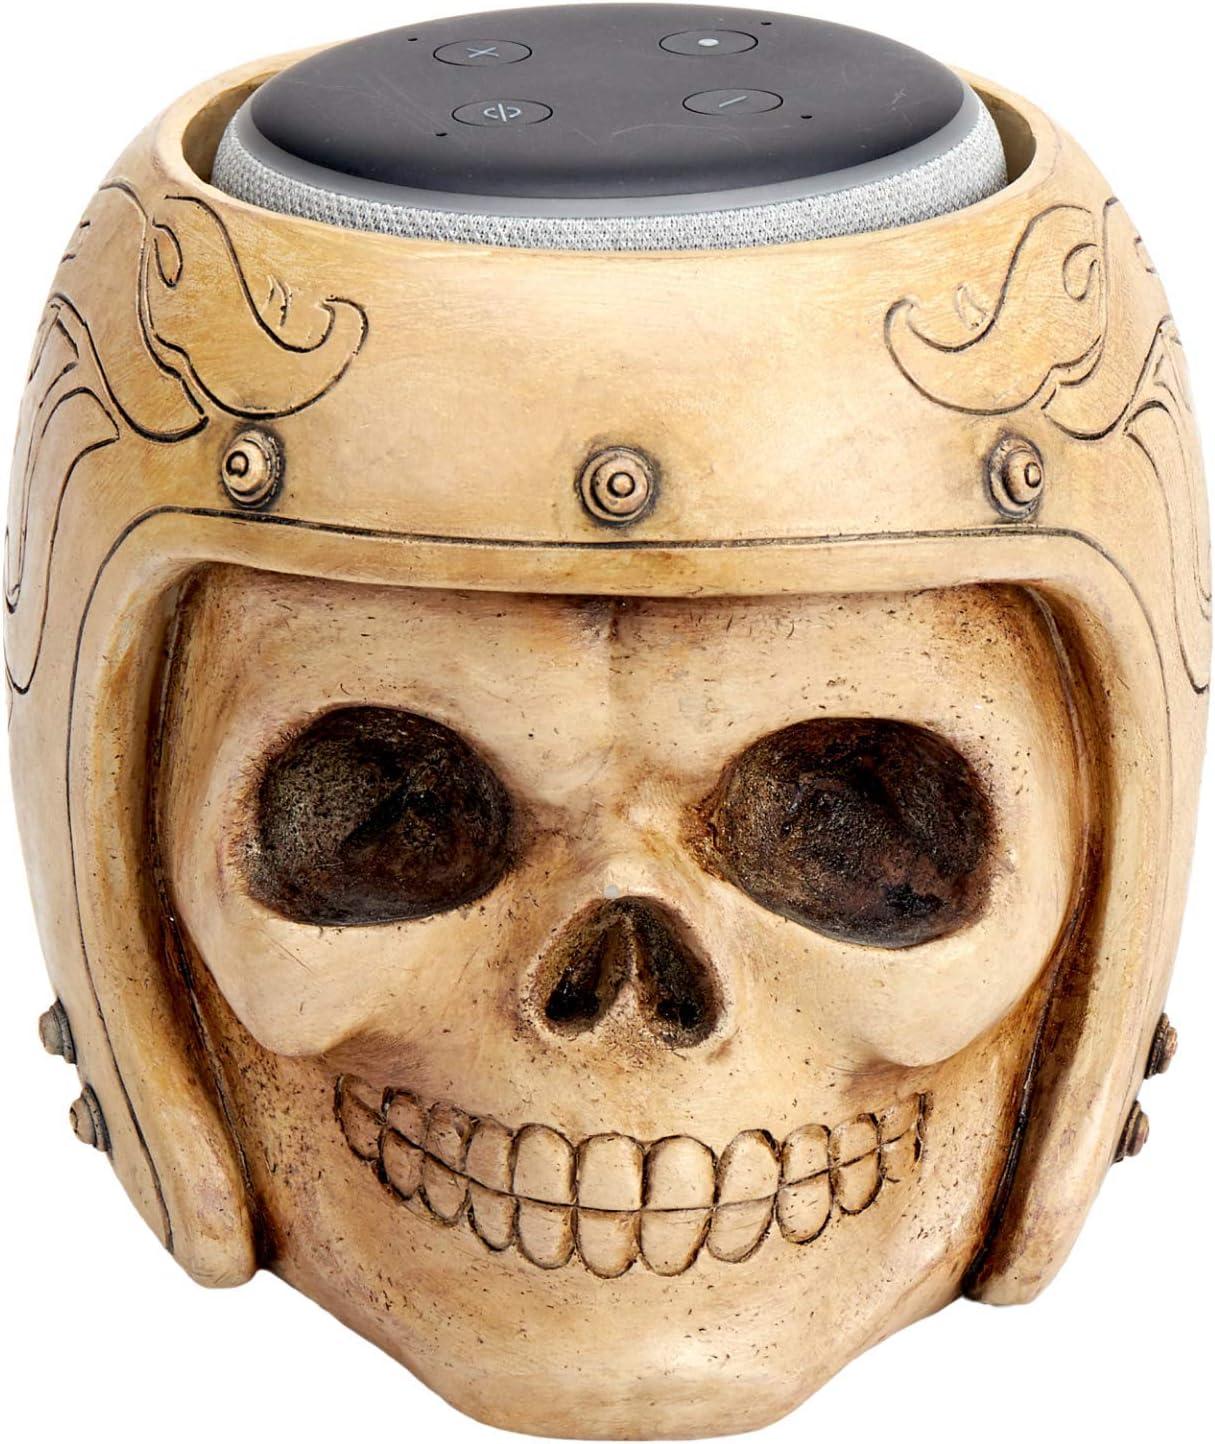 Echo Dot Stand,Smart Speaker Stand Holder for Echo Dot 3rd Generation,Speaker Holder,Skull Statue Crafted,Home,Offfice,Living Room Decorations